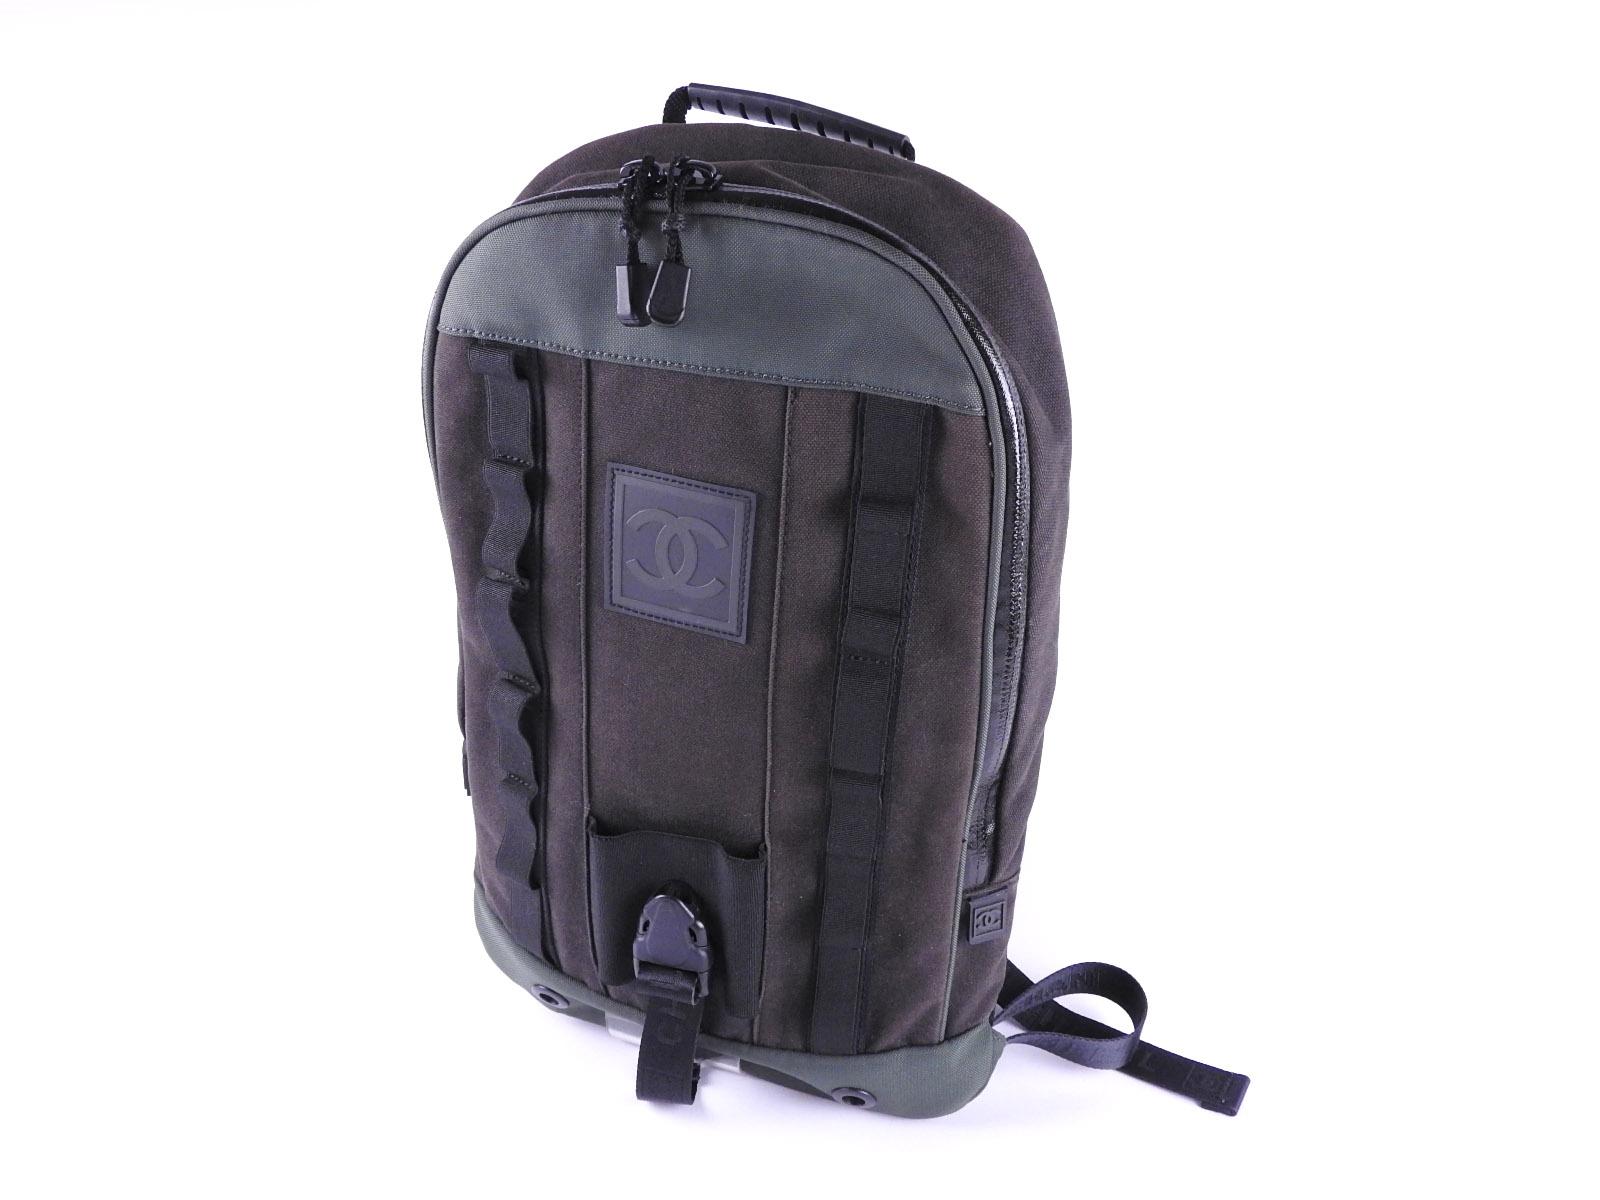 bf54a6b21 Auth CHANEL CC Sport Backpack Bag Daypack Nylon Canvas Black Green B-4518